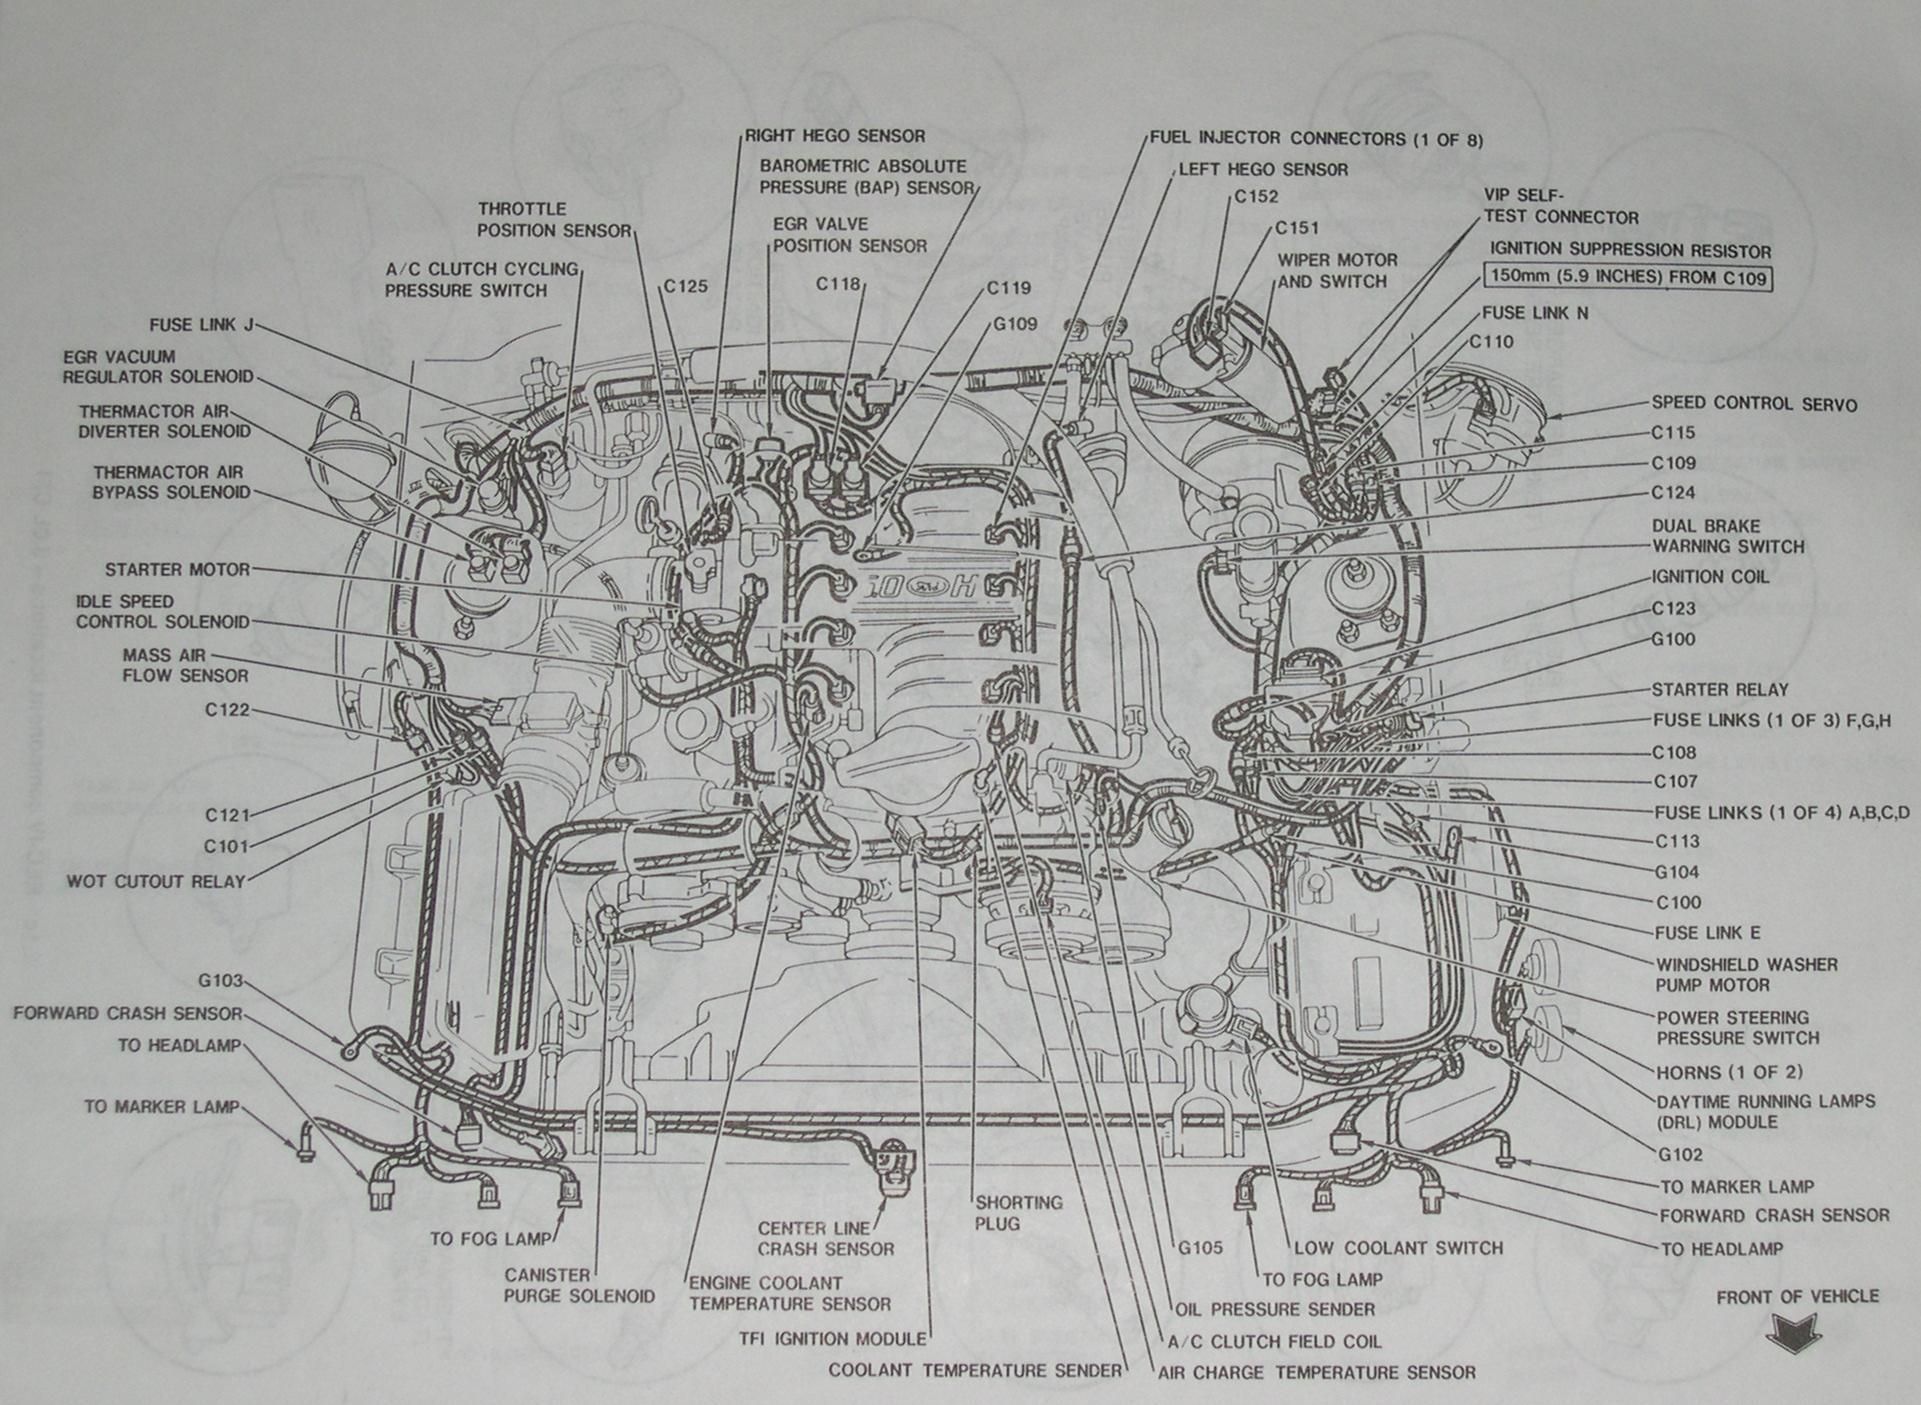 Wiring Diagram 2001 Mustang Convertible